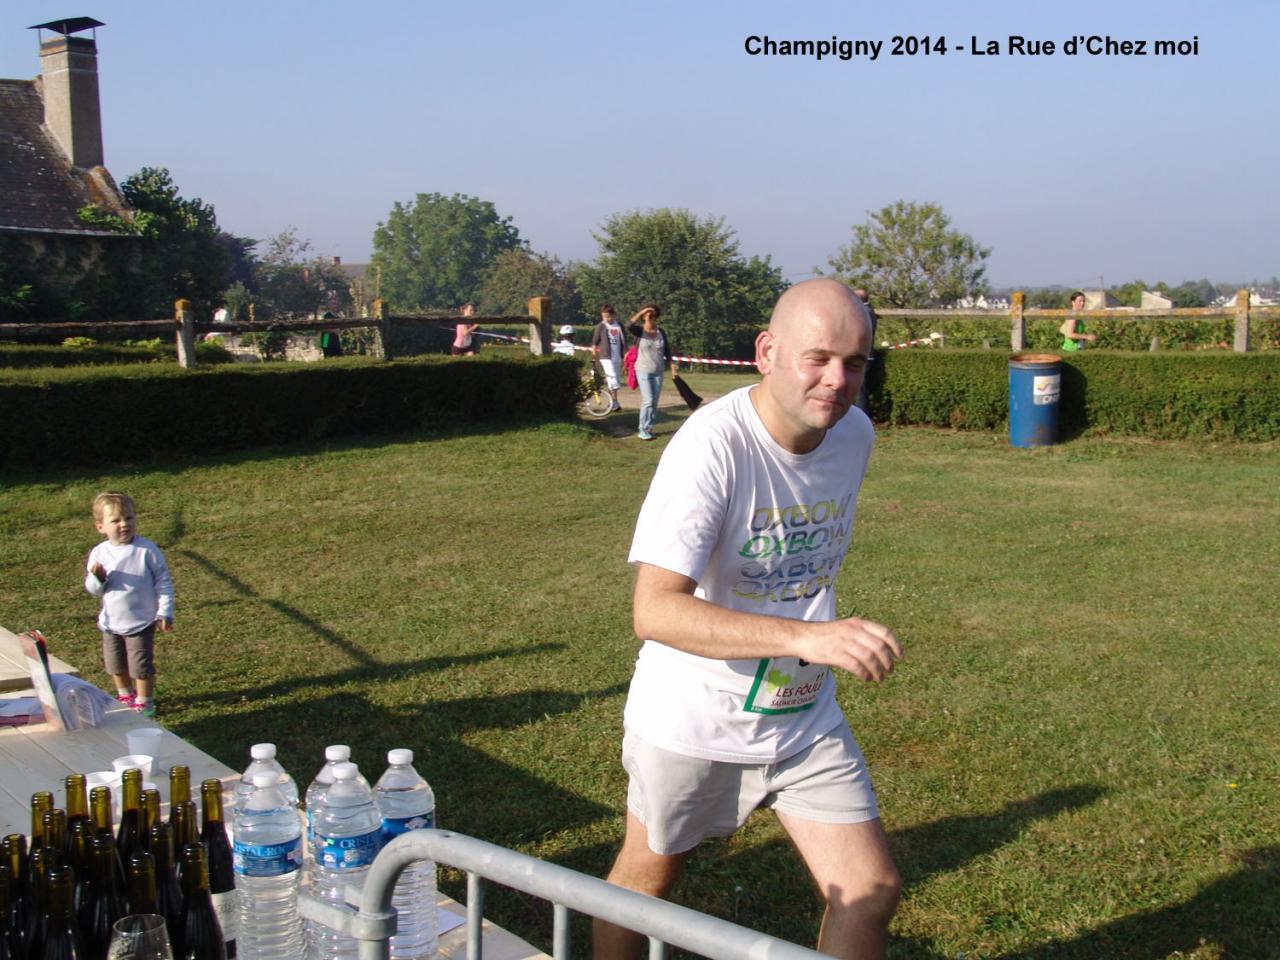 Champigny 2014 - Rue d'Chez Moi (15)